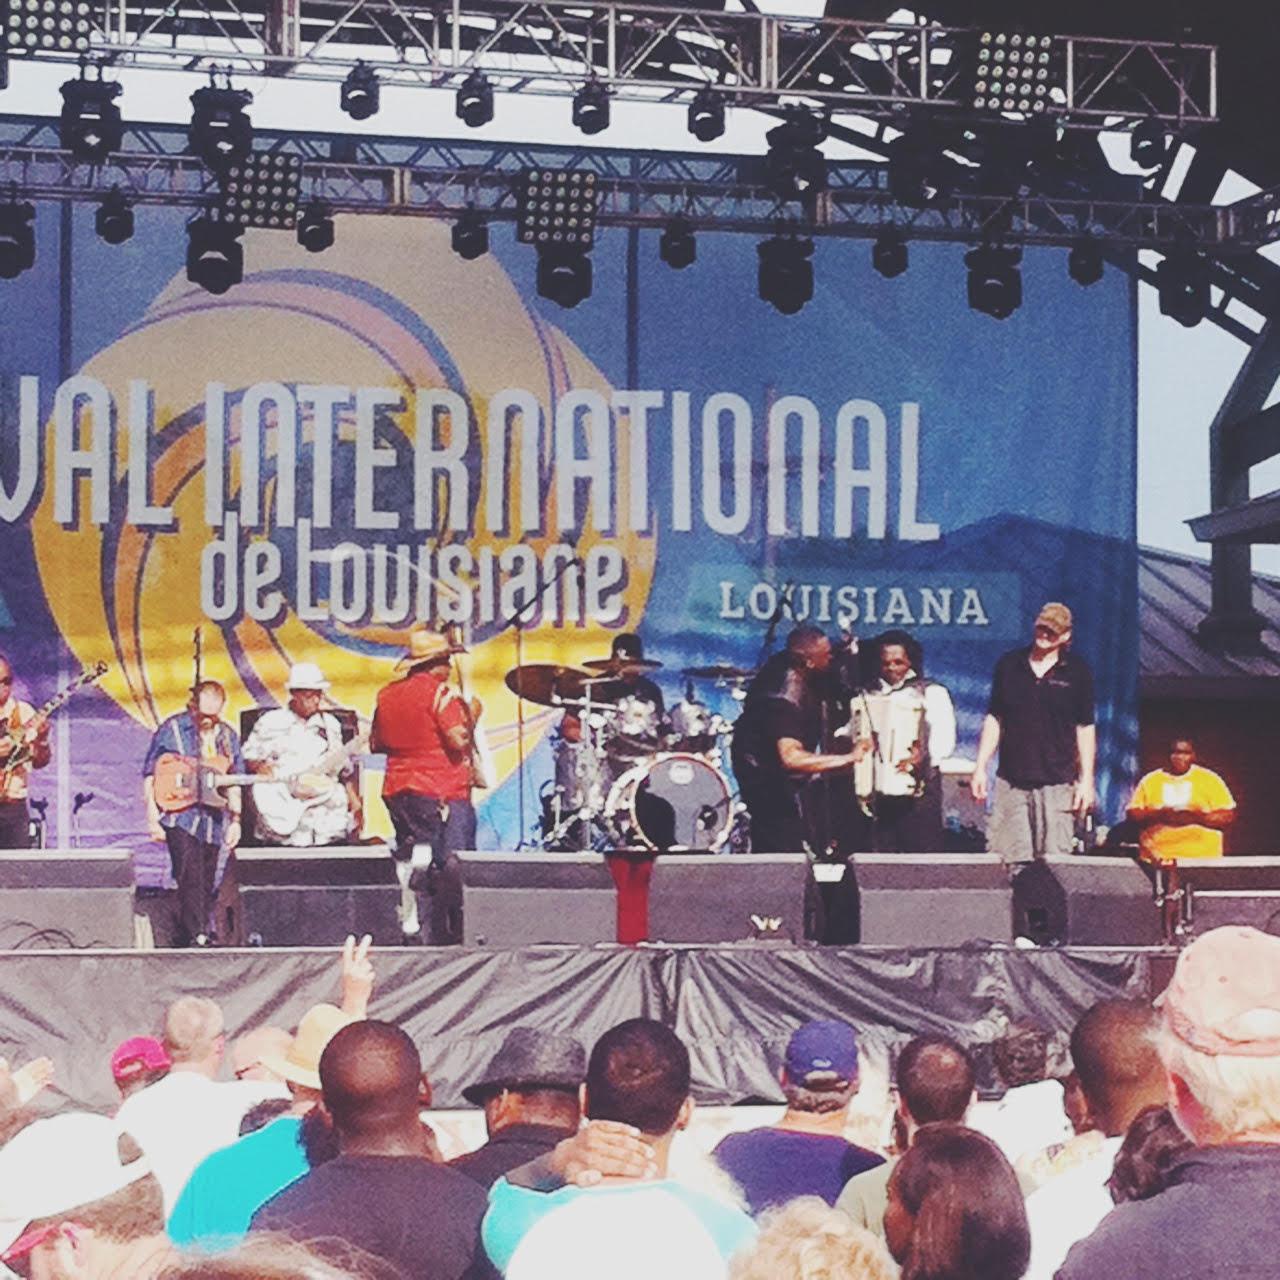 Buckwheat Zydeco headliningFestival International de Louisiana 2015